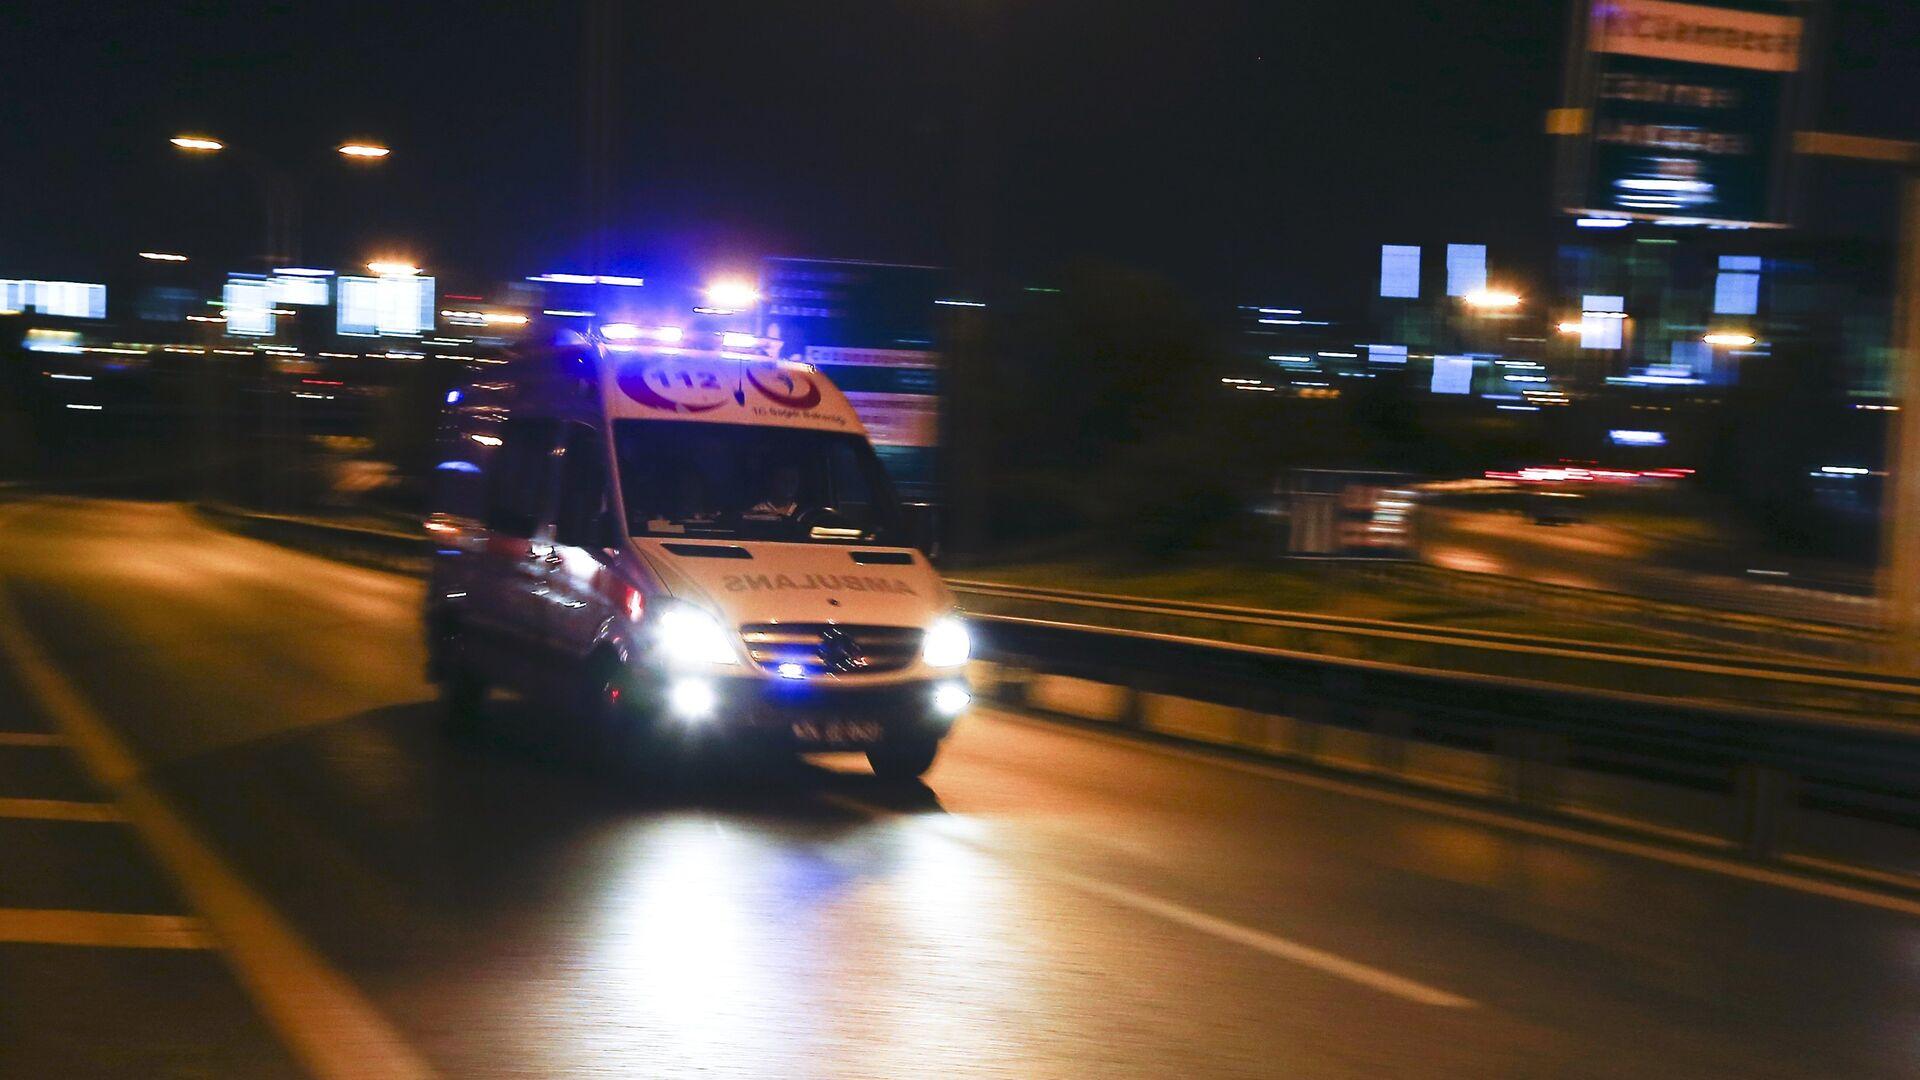 An ambulance arrives at the Ataturk airport in Istanbul - Sputnik Italia, 1920, 02.08.2021